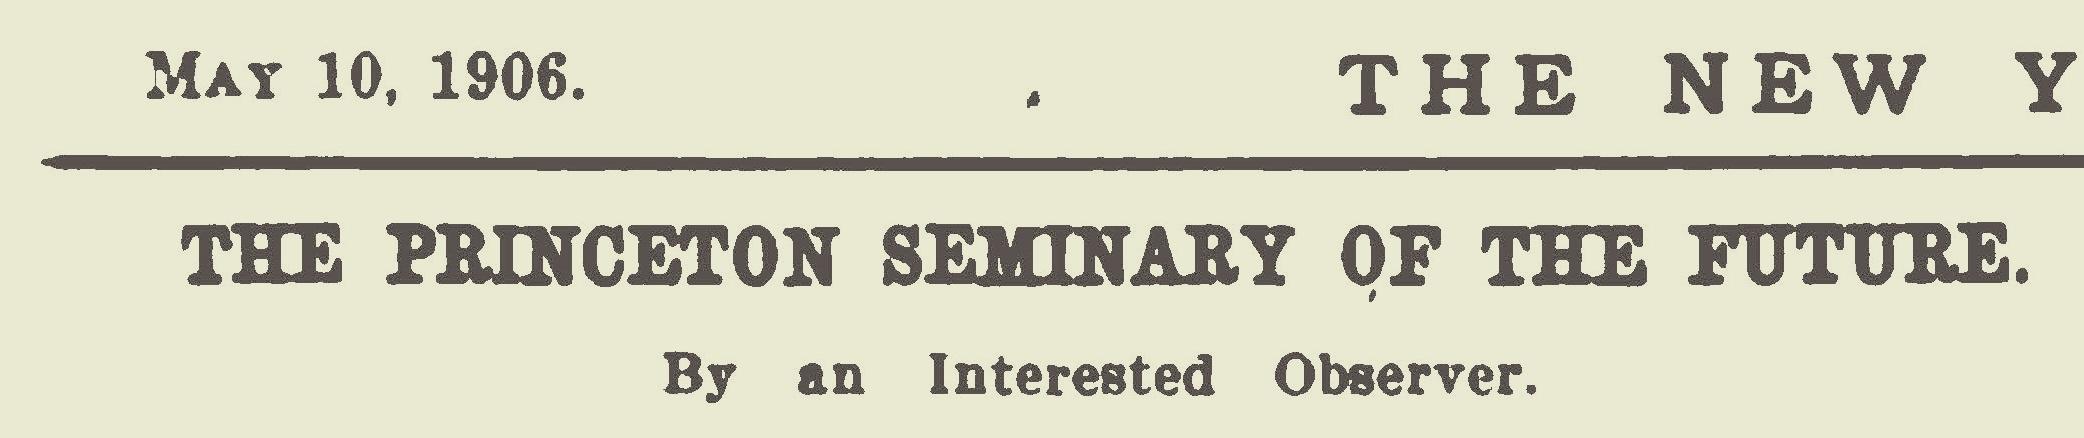 Warfield, Benjamin Breckinridge, The Princeton Seminary of the Future Title Page.jpg